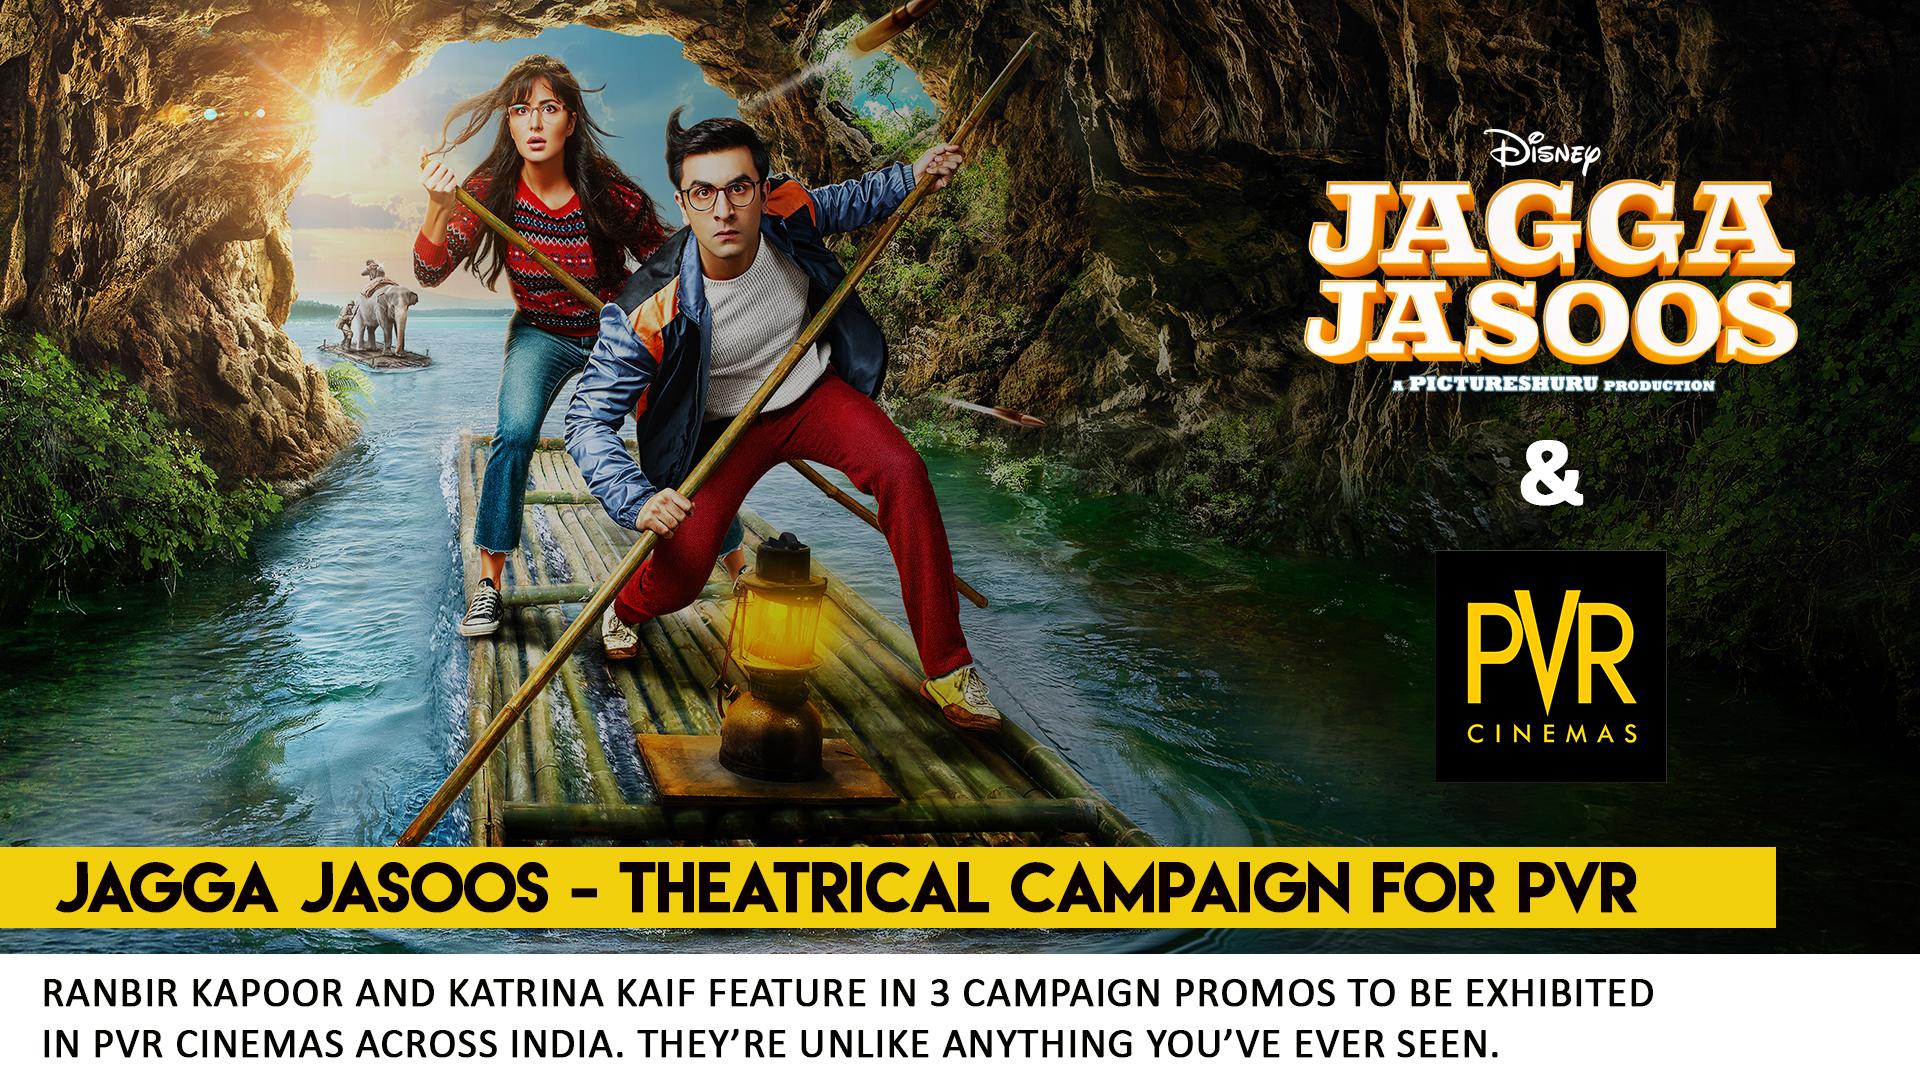 Jagga Jasoos - Trailers for PVR